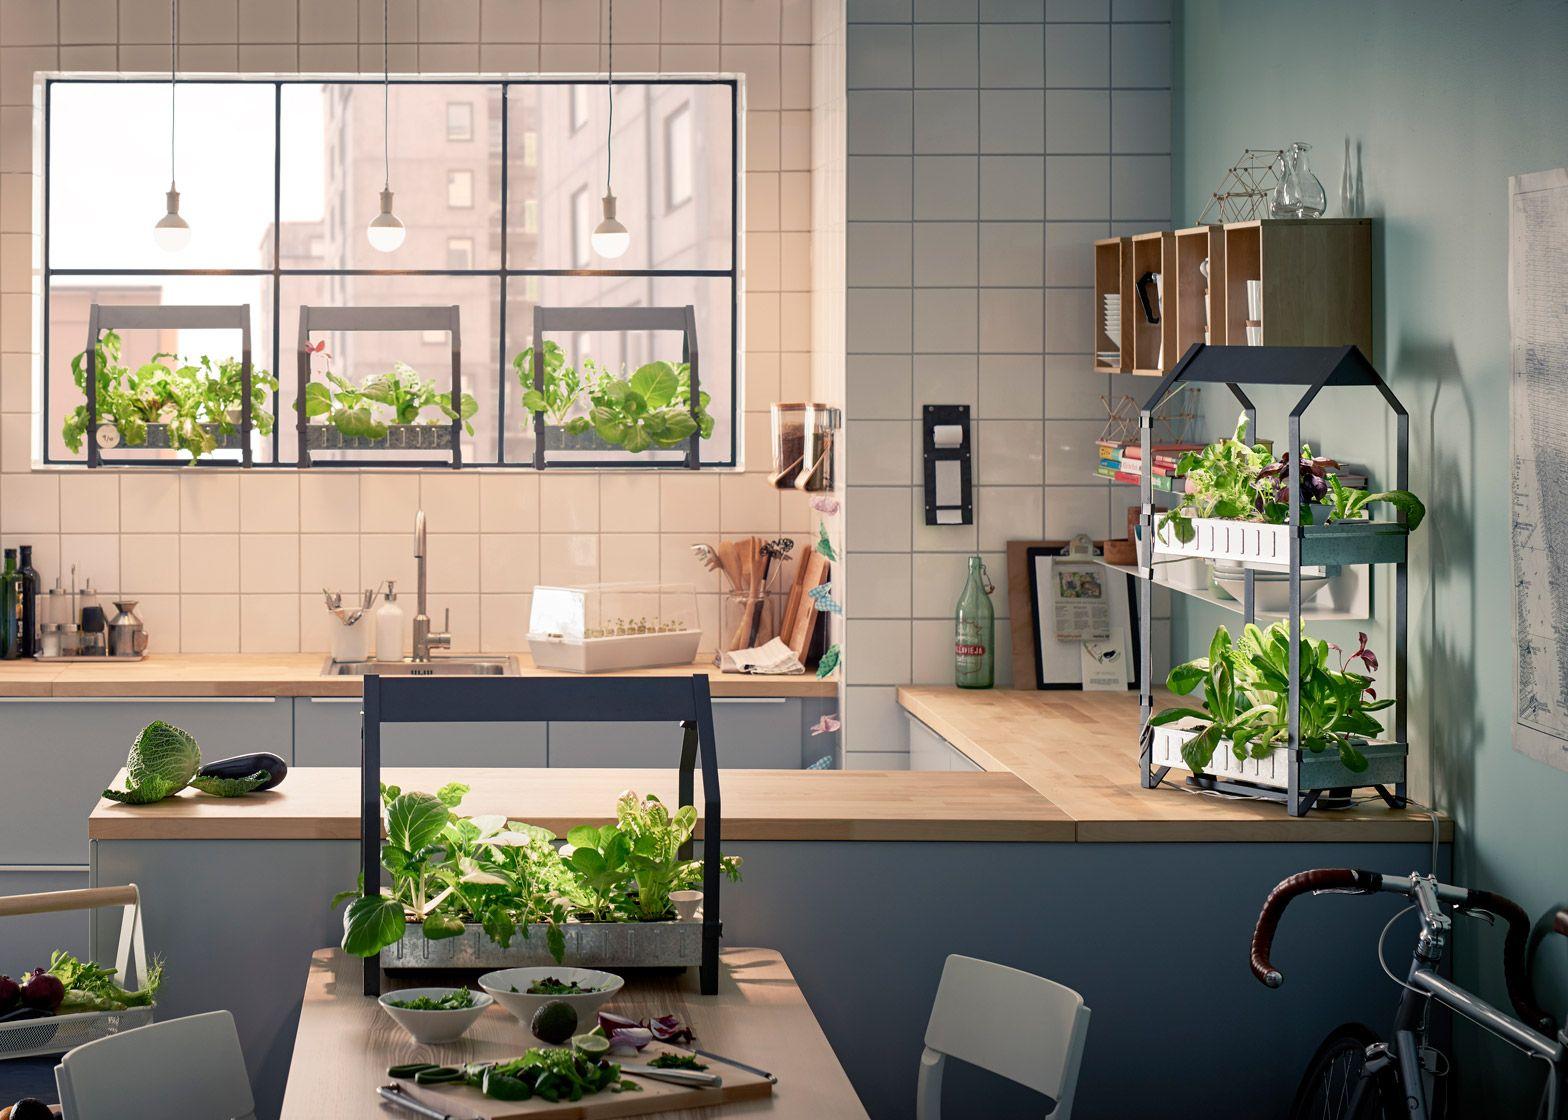 Growco Indoor Garden Supply Ikea moves into indoor gardening with hydroponic kit millennial ikea moves into indoor gardening with hydroponic kit workwithnaturefo